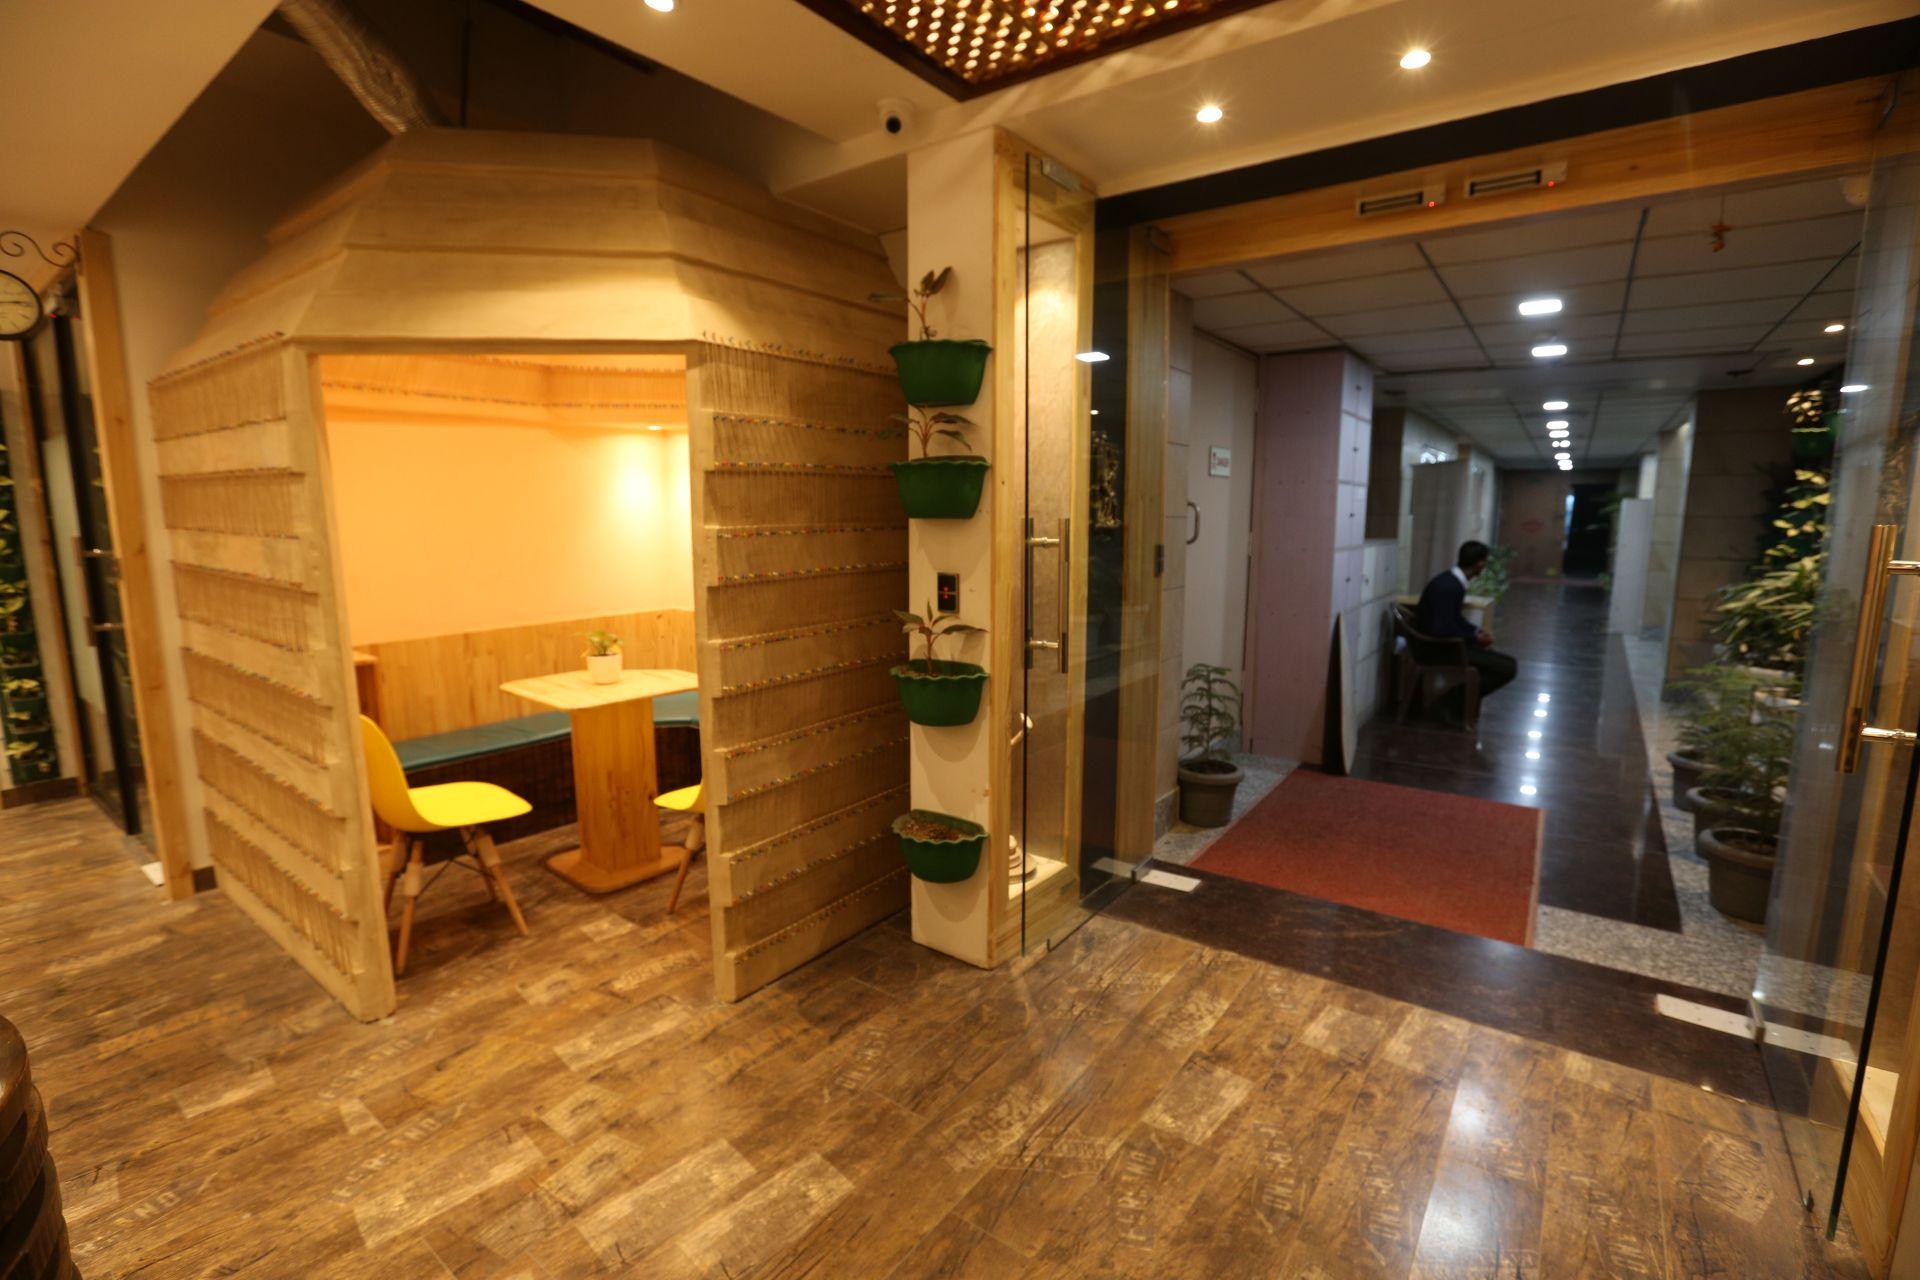 Kocreate, Noida